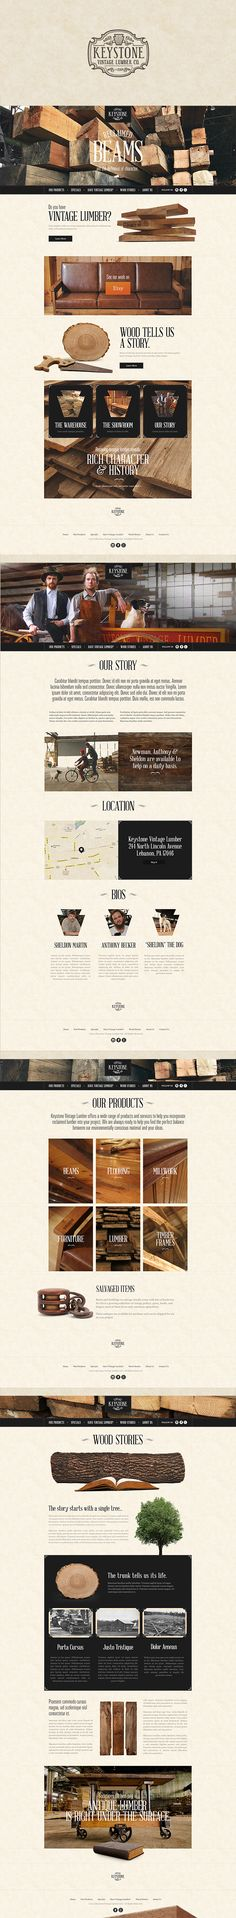 Keystone Vintage Lumber Company by Justin Freiler #website #design #digital